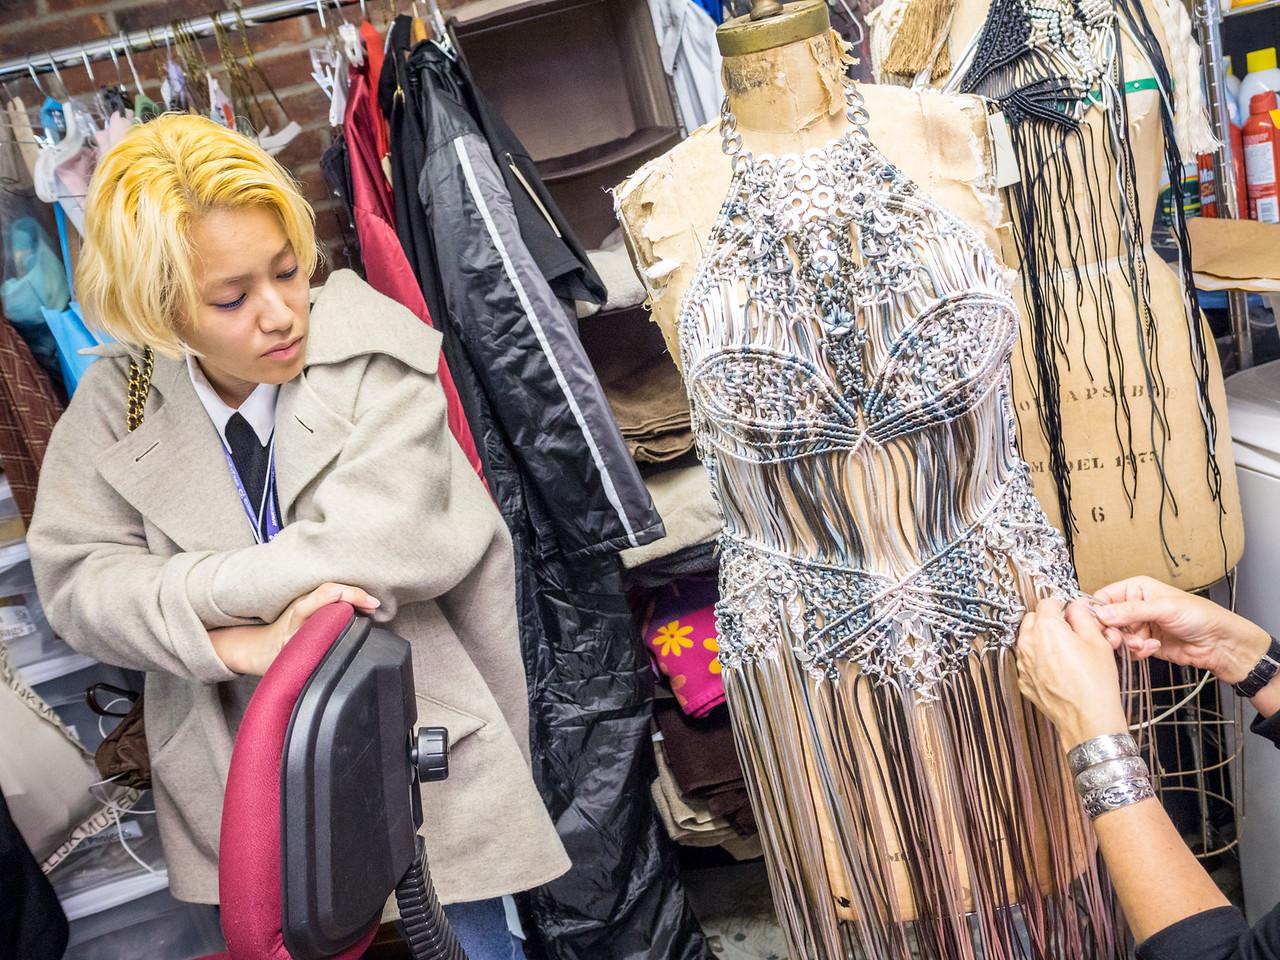 110614_6514_Costume Shop - Global Ed